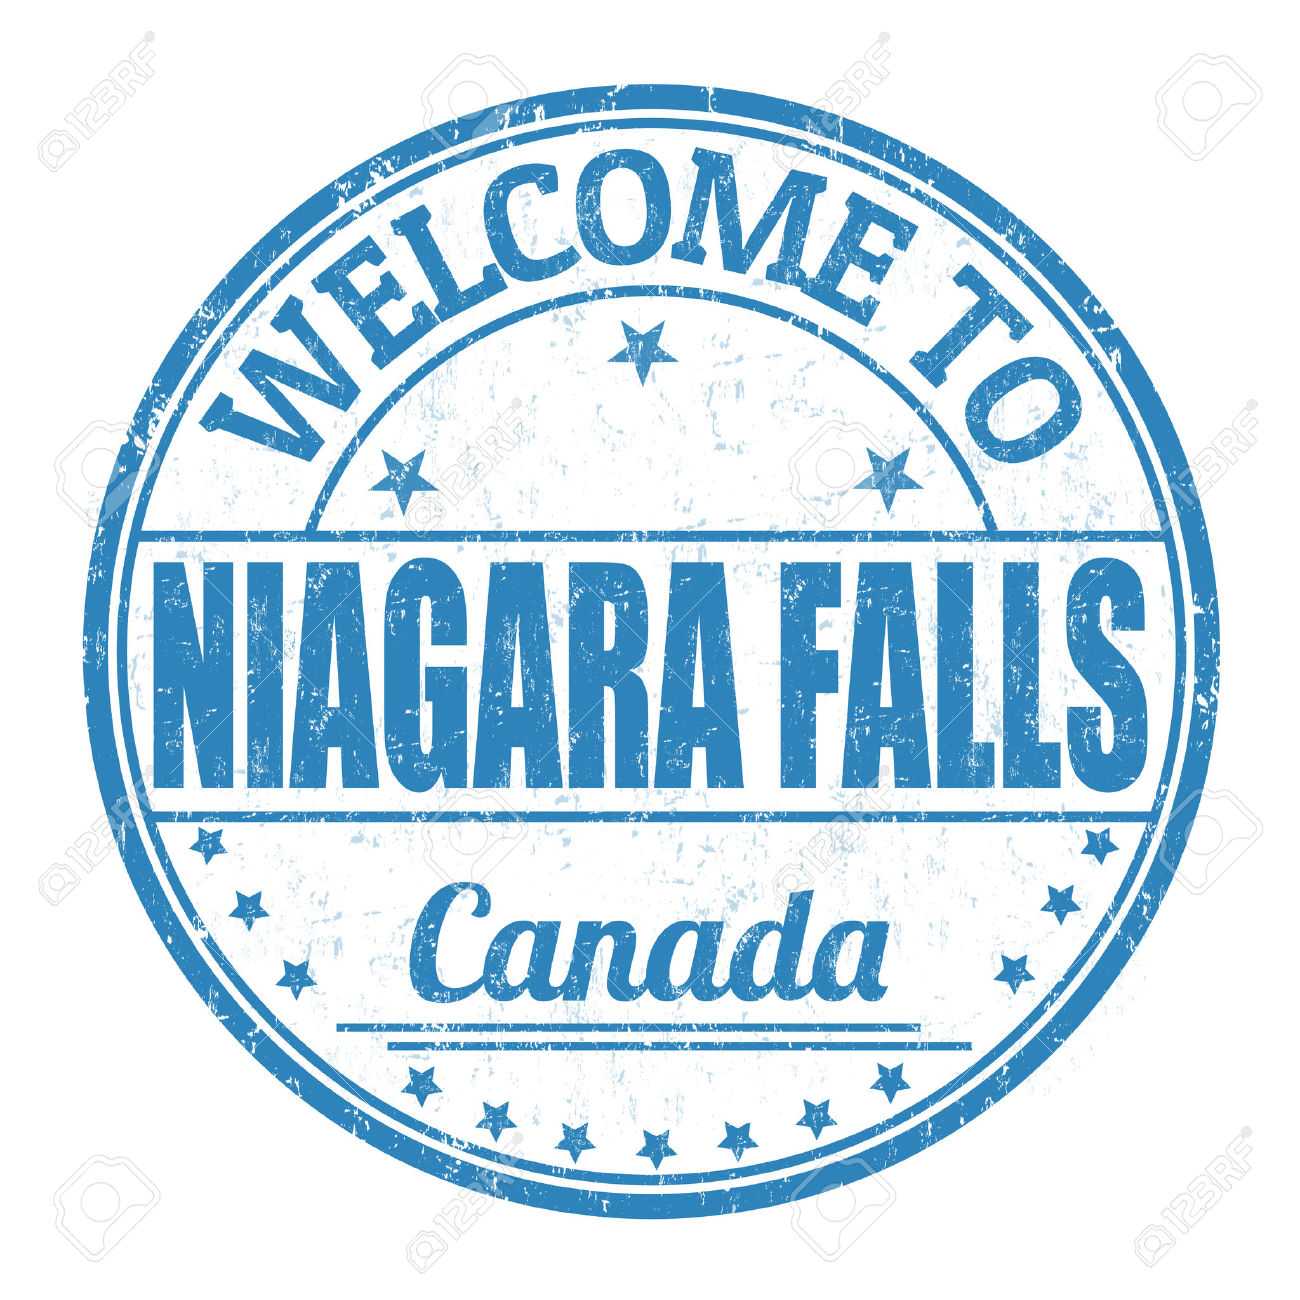 Niagara Falls clipart #8, Download drawings